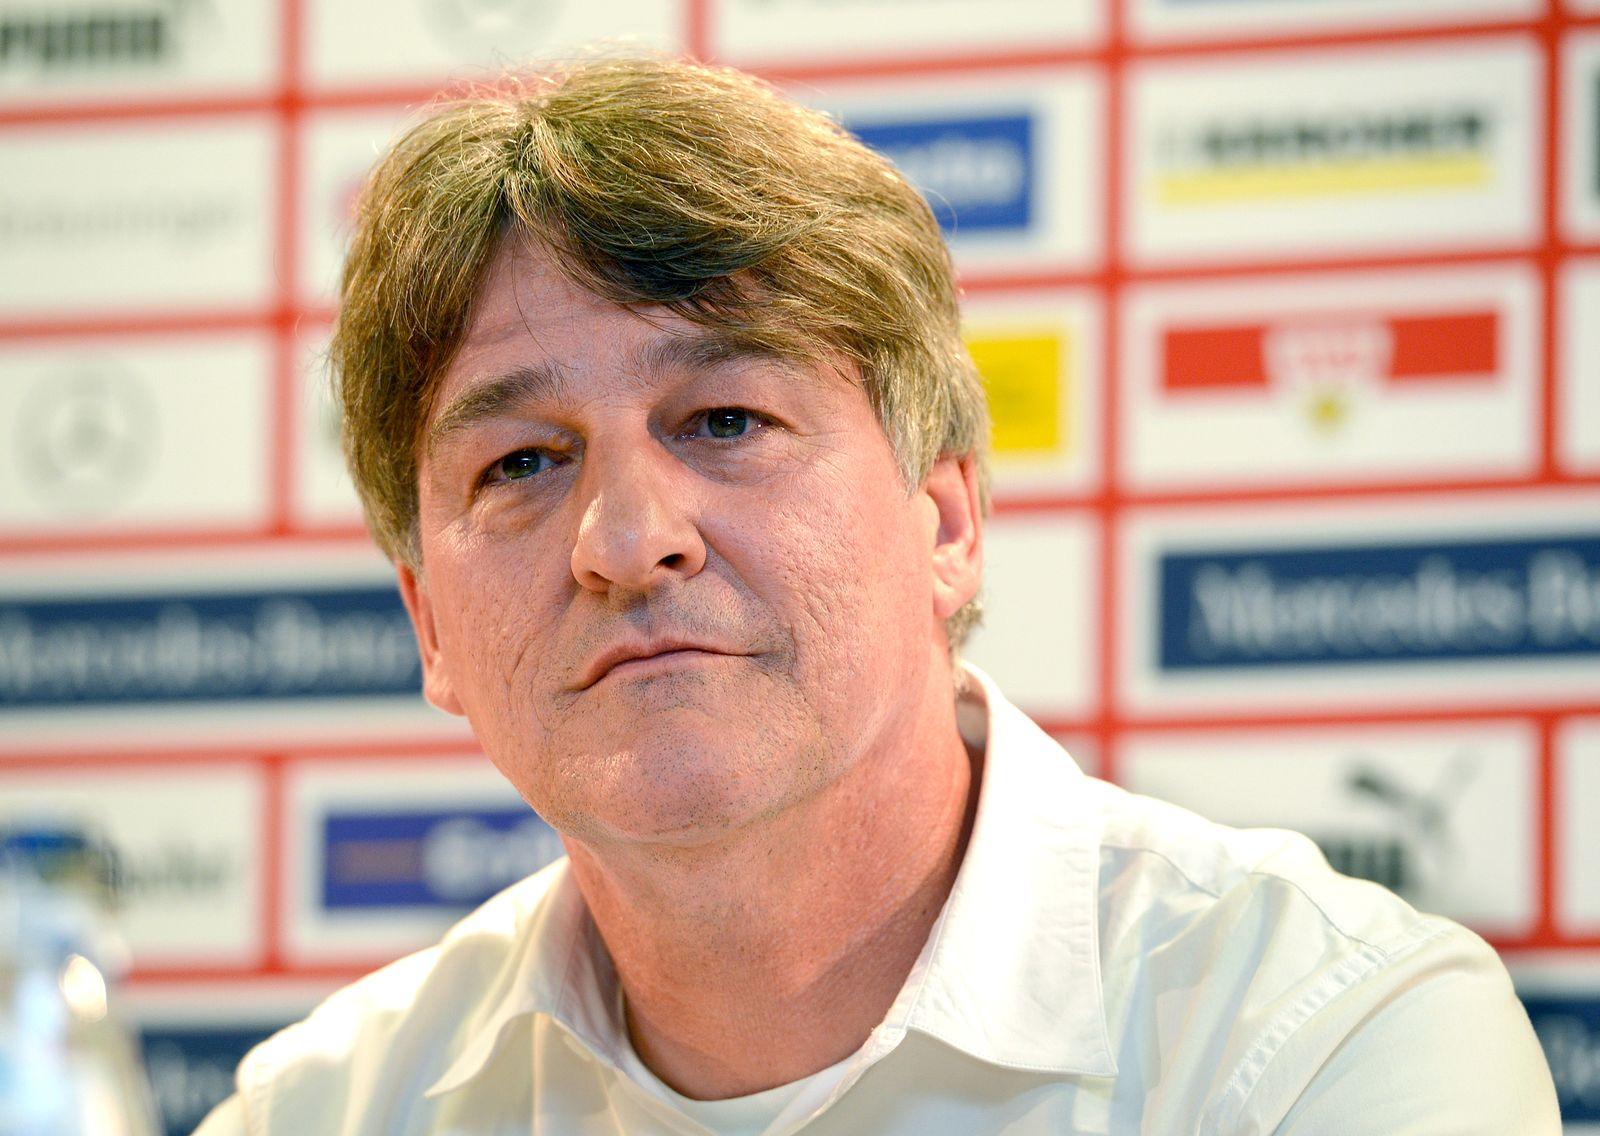 VfB Stuttgart - Pk mit Bernd Wahler